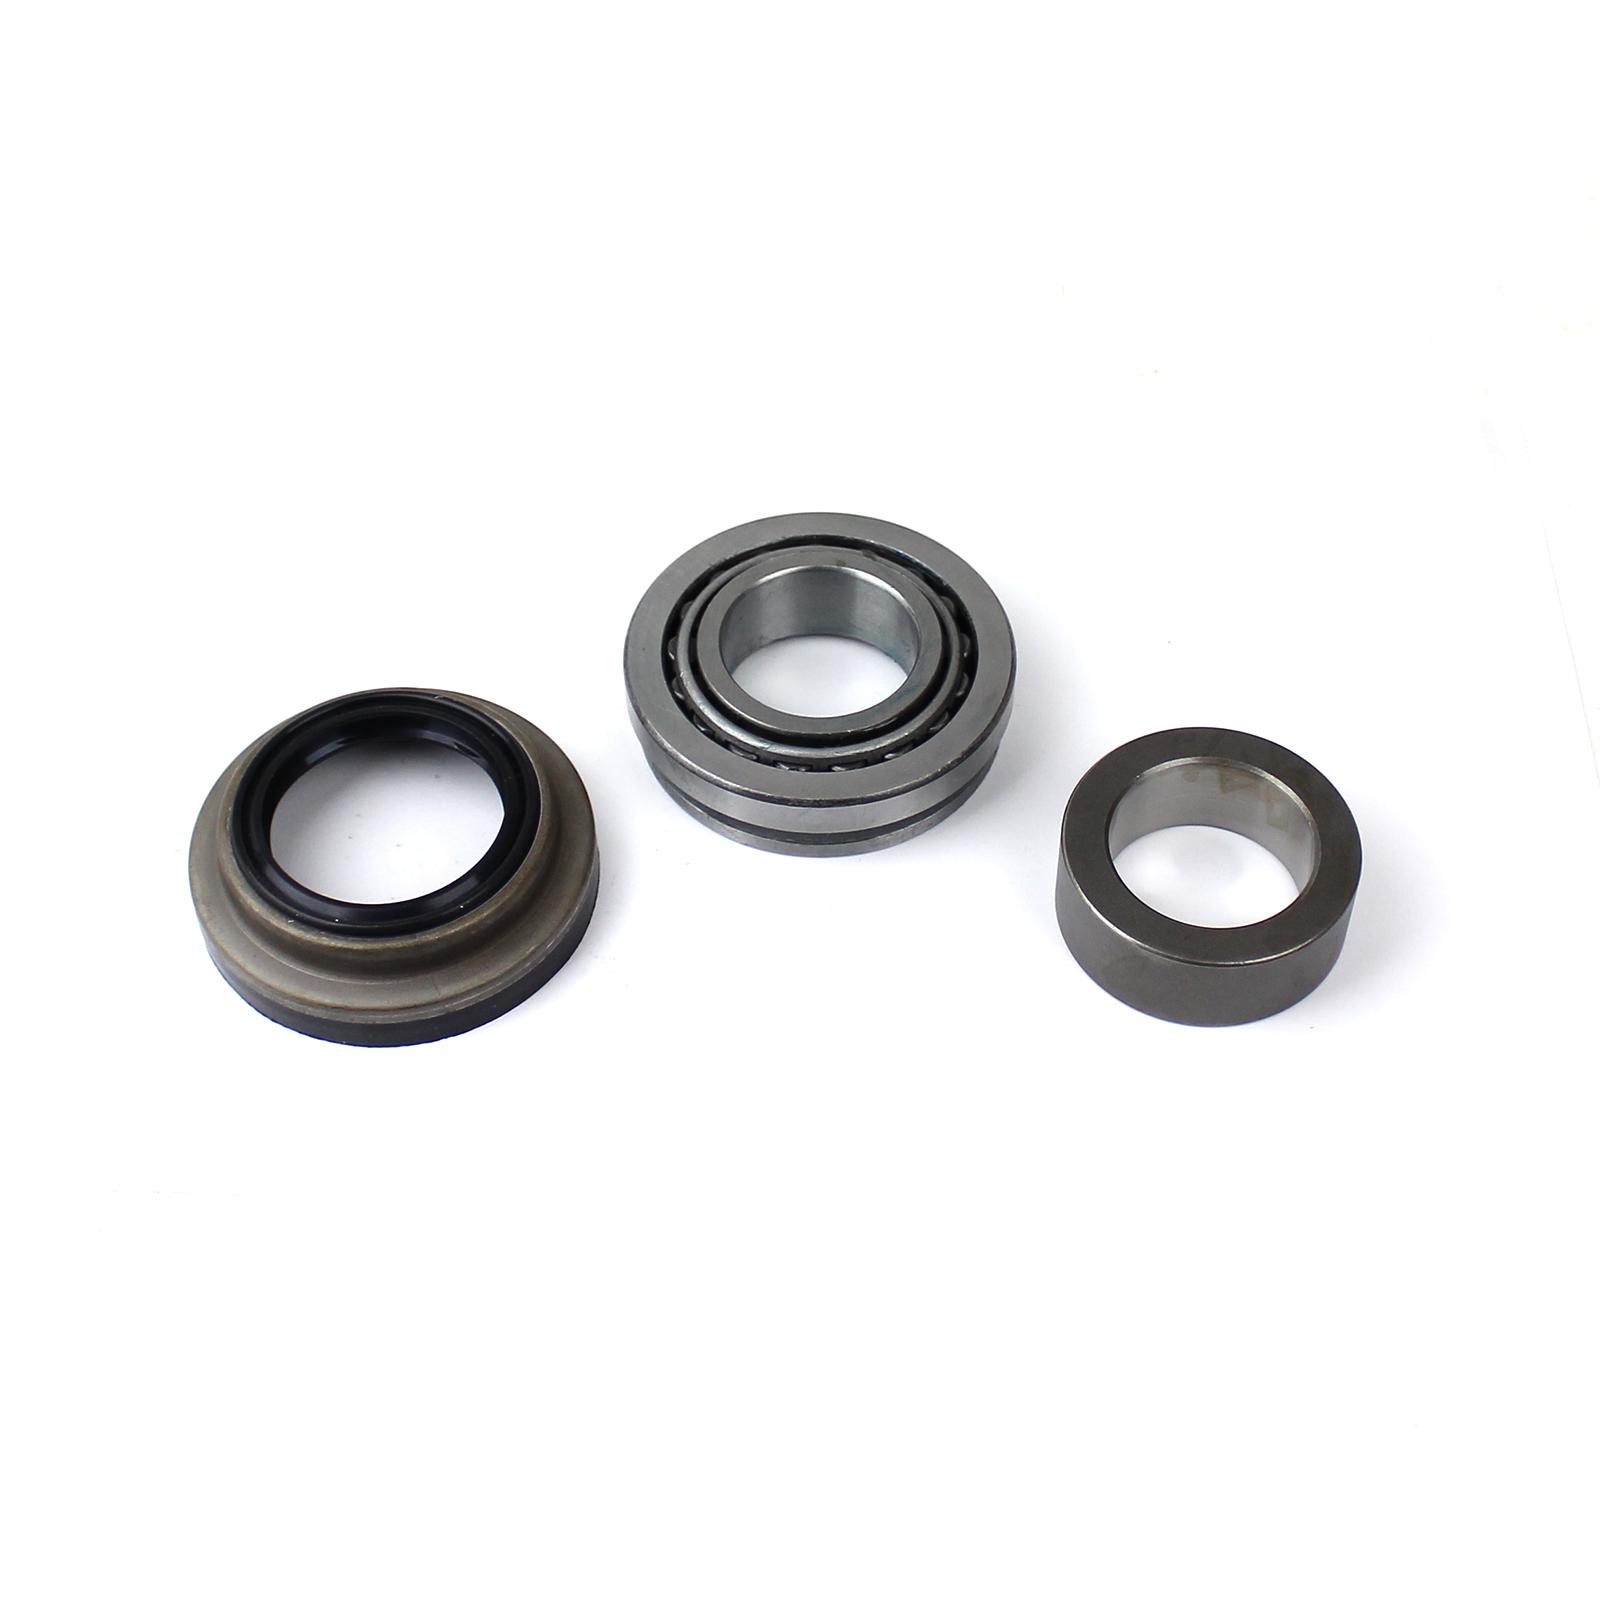 "Axle Bearing Industry Std Ref: Set 20 (80mm x 1.562"") T/R"